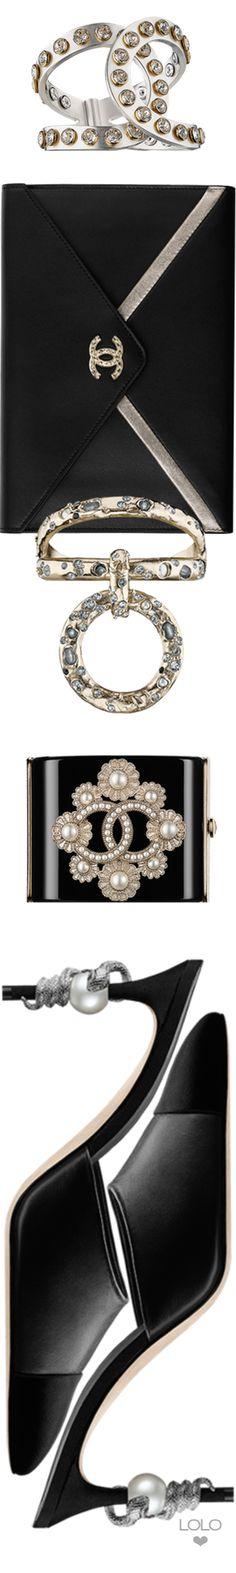 Chanel 2015/16 Métiers d'Art | LOLO❤︎